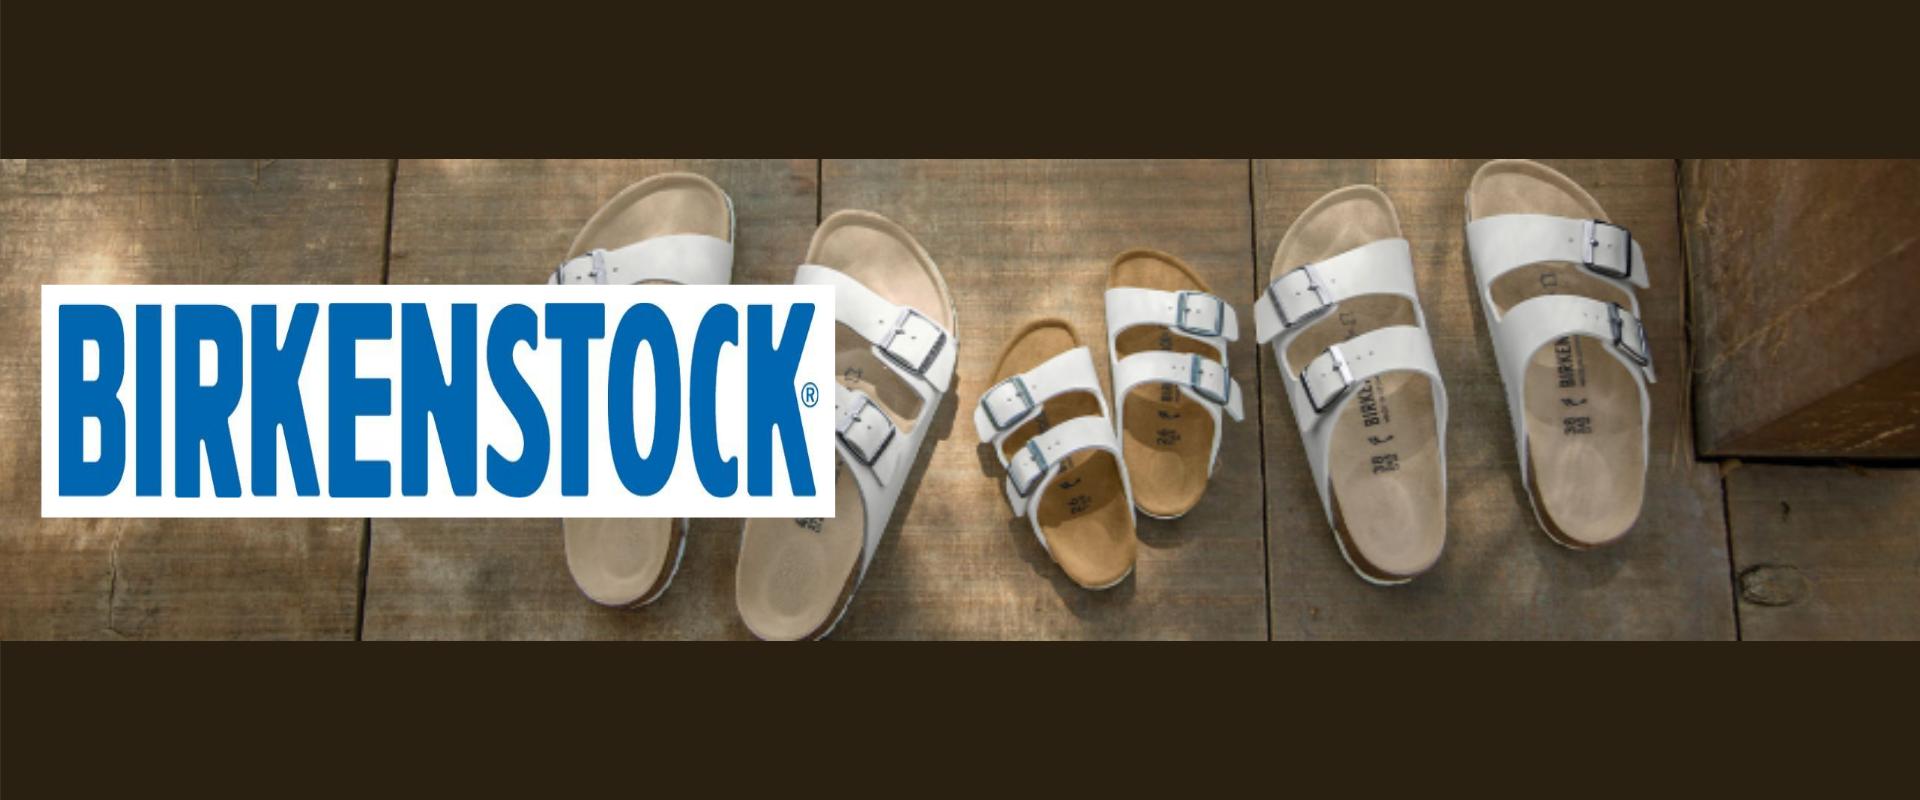 birkenstock-brand-banner.png